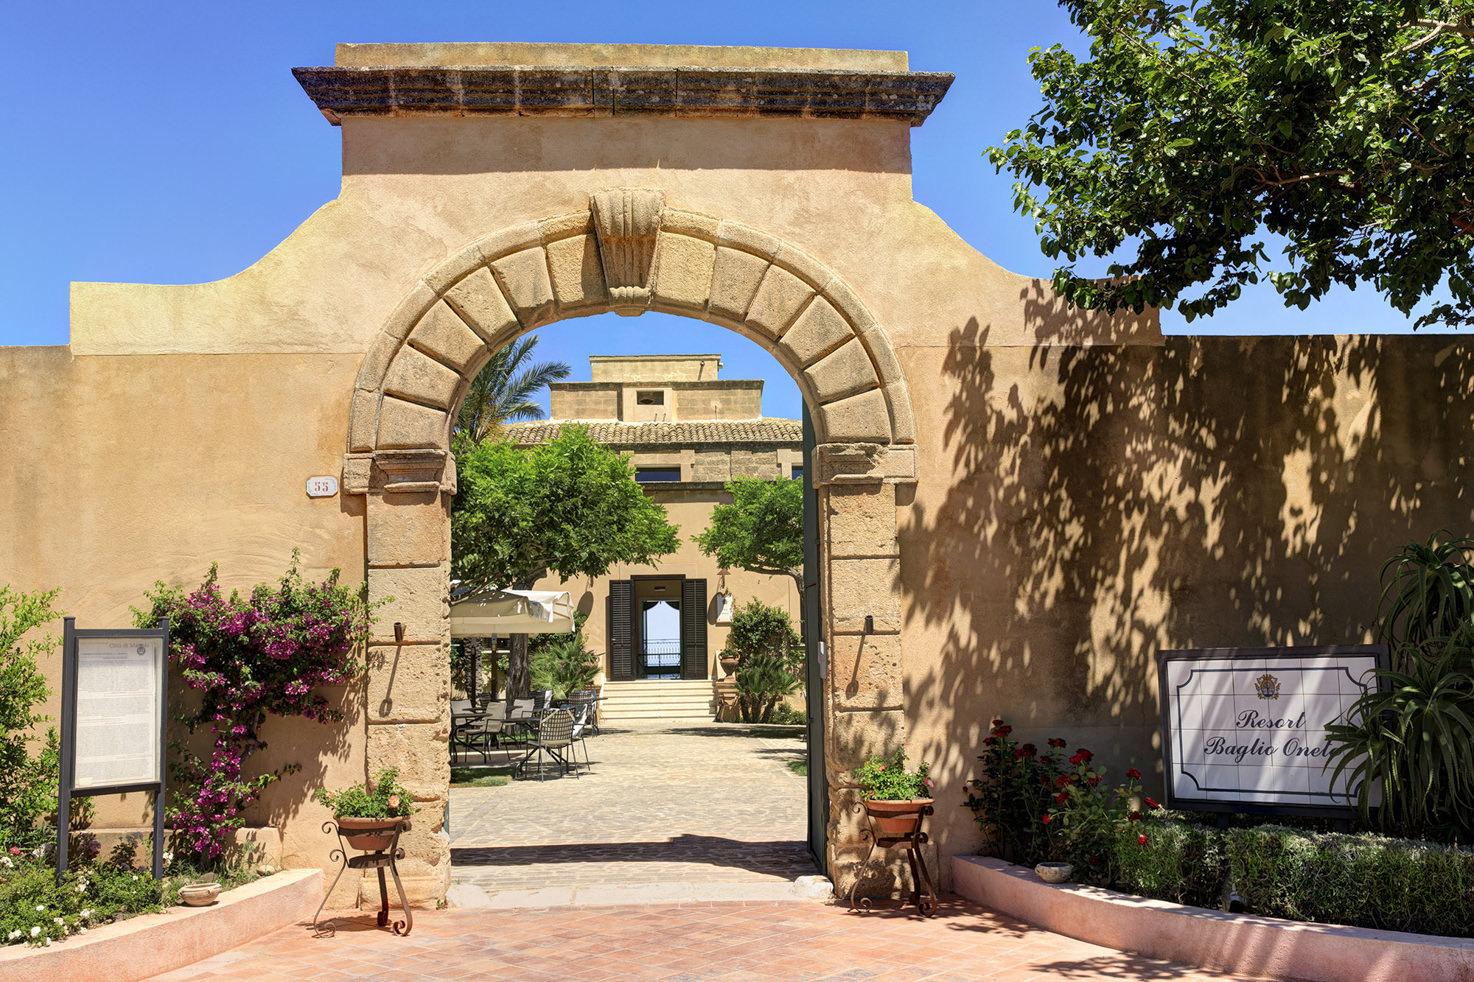 Entrance of Baglio Oneto in Sicily